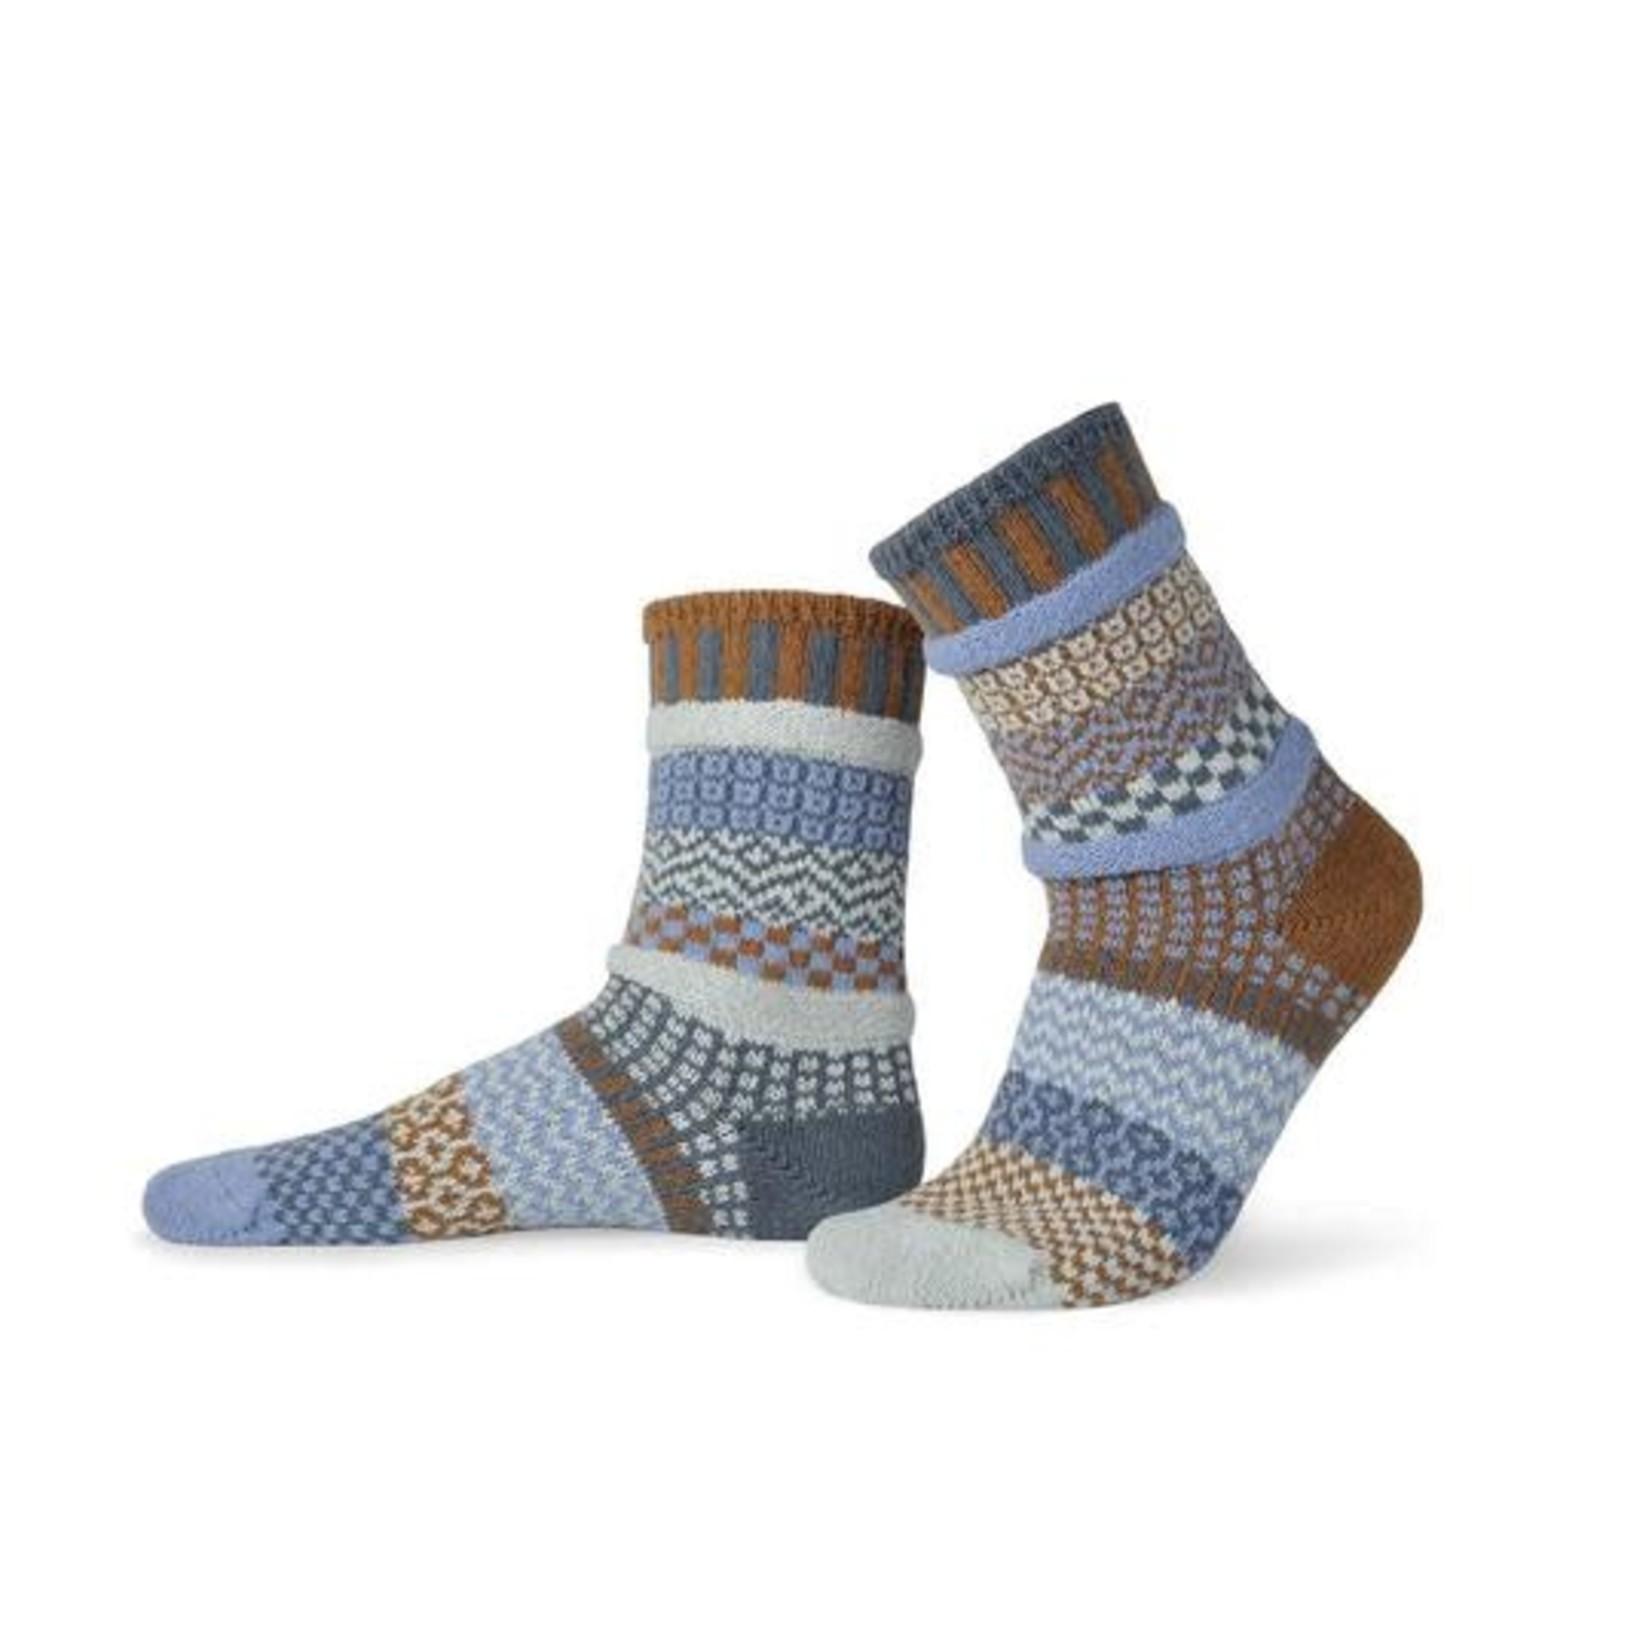 Solmates Foxtail Crew Socks